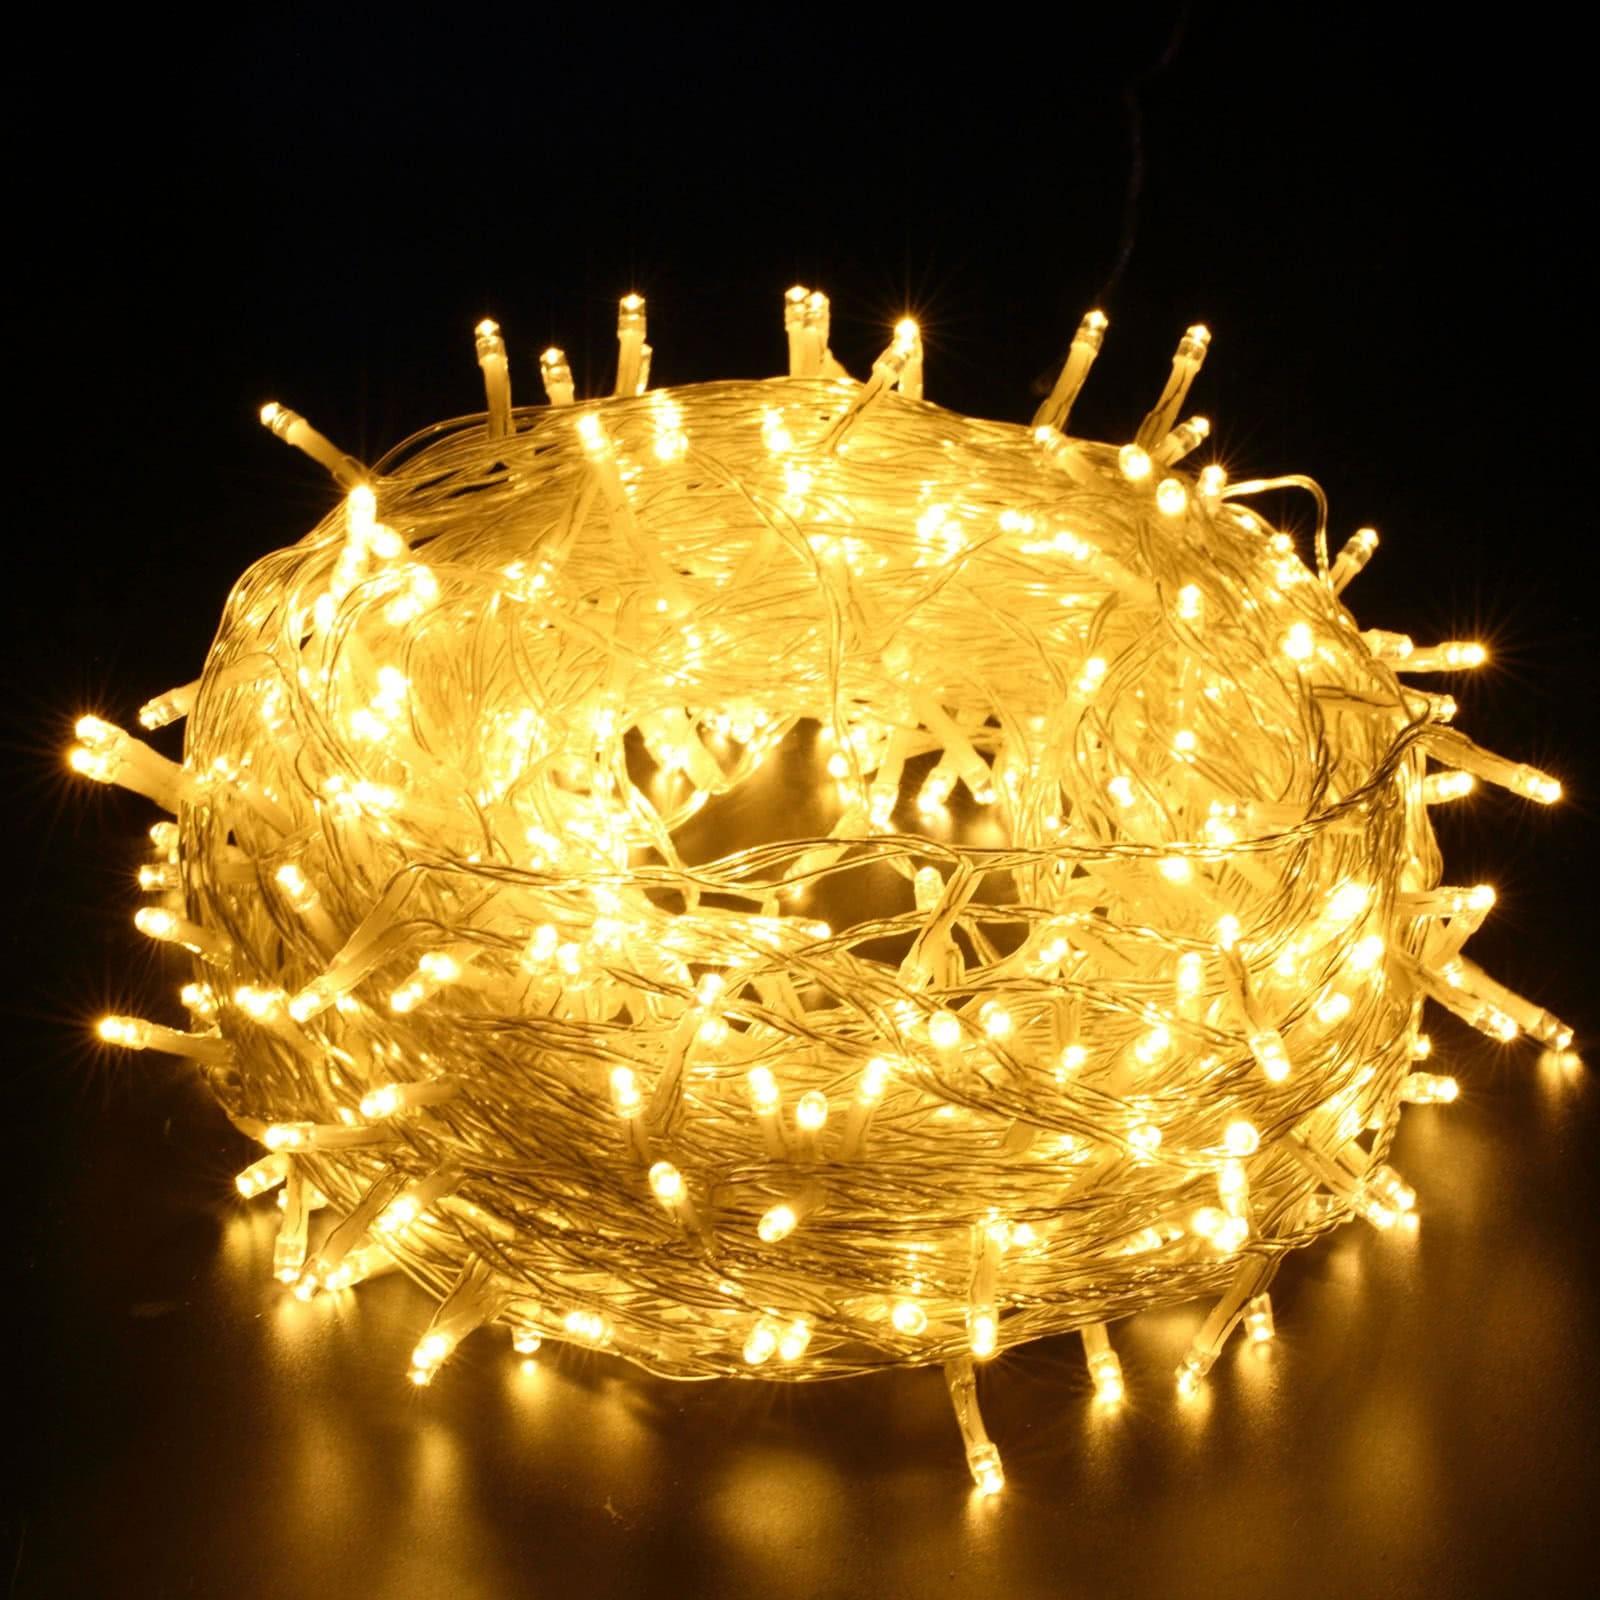 Led Weihnachtsbeleuchtung Warmweiss.400er Led Lichterkette Warmweiß Yorbay De